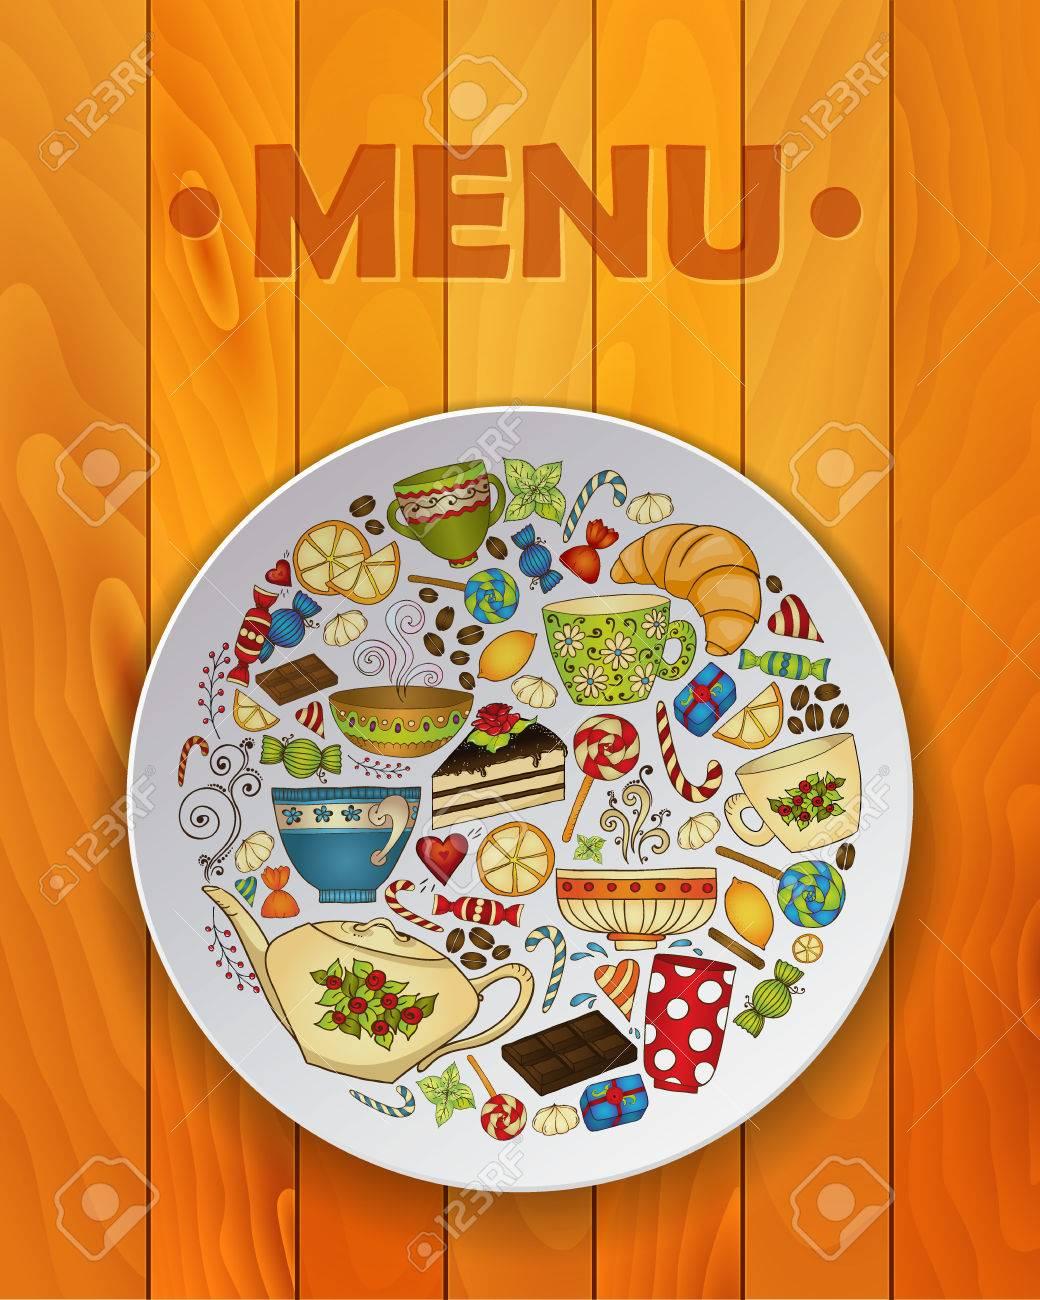 Breakfast Doodles : breakfast, doodles, Coffee, Sketch, Doodles, White, Plate, Restaurant, Menu..., Royalty, Cliparts,, Vectors,, Stock, Illustration., Image, 34480121.